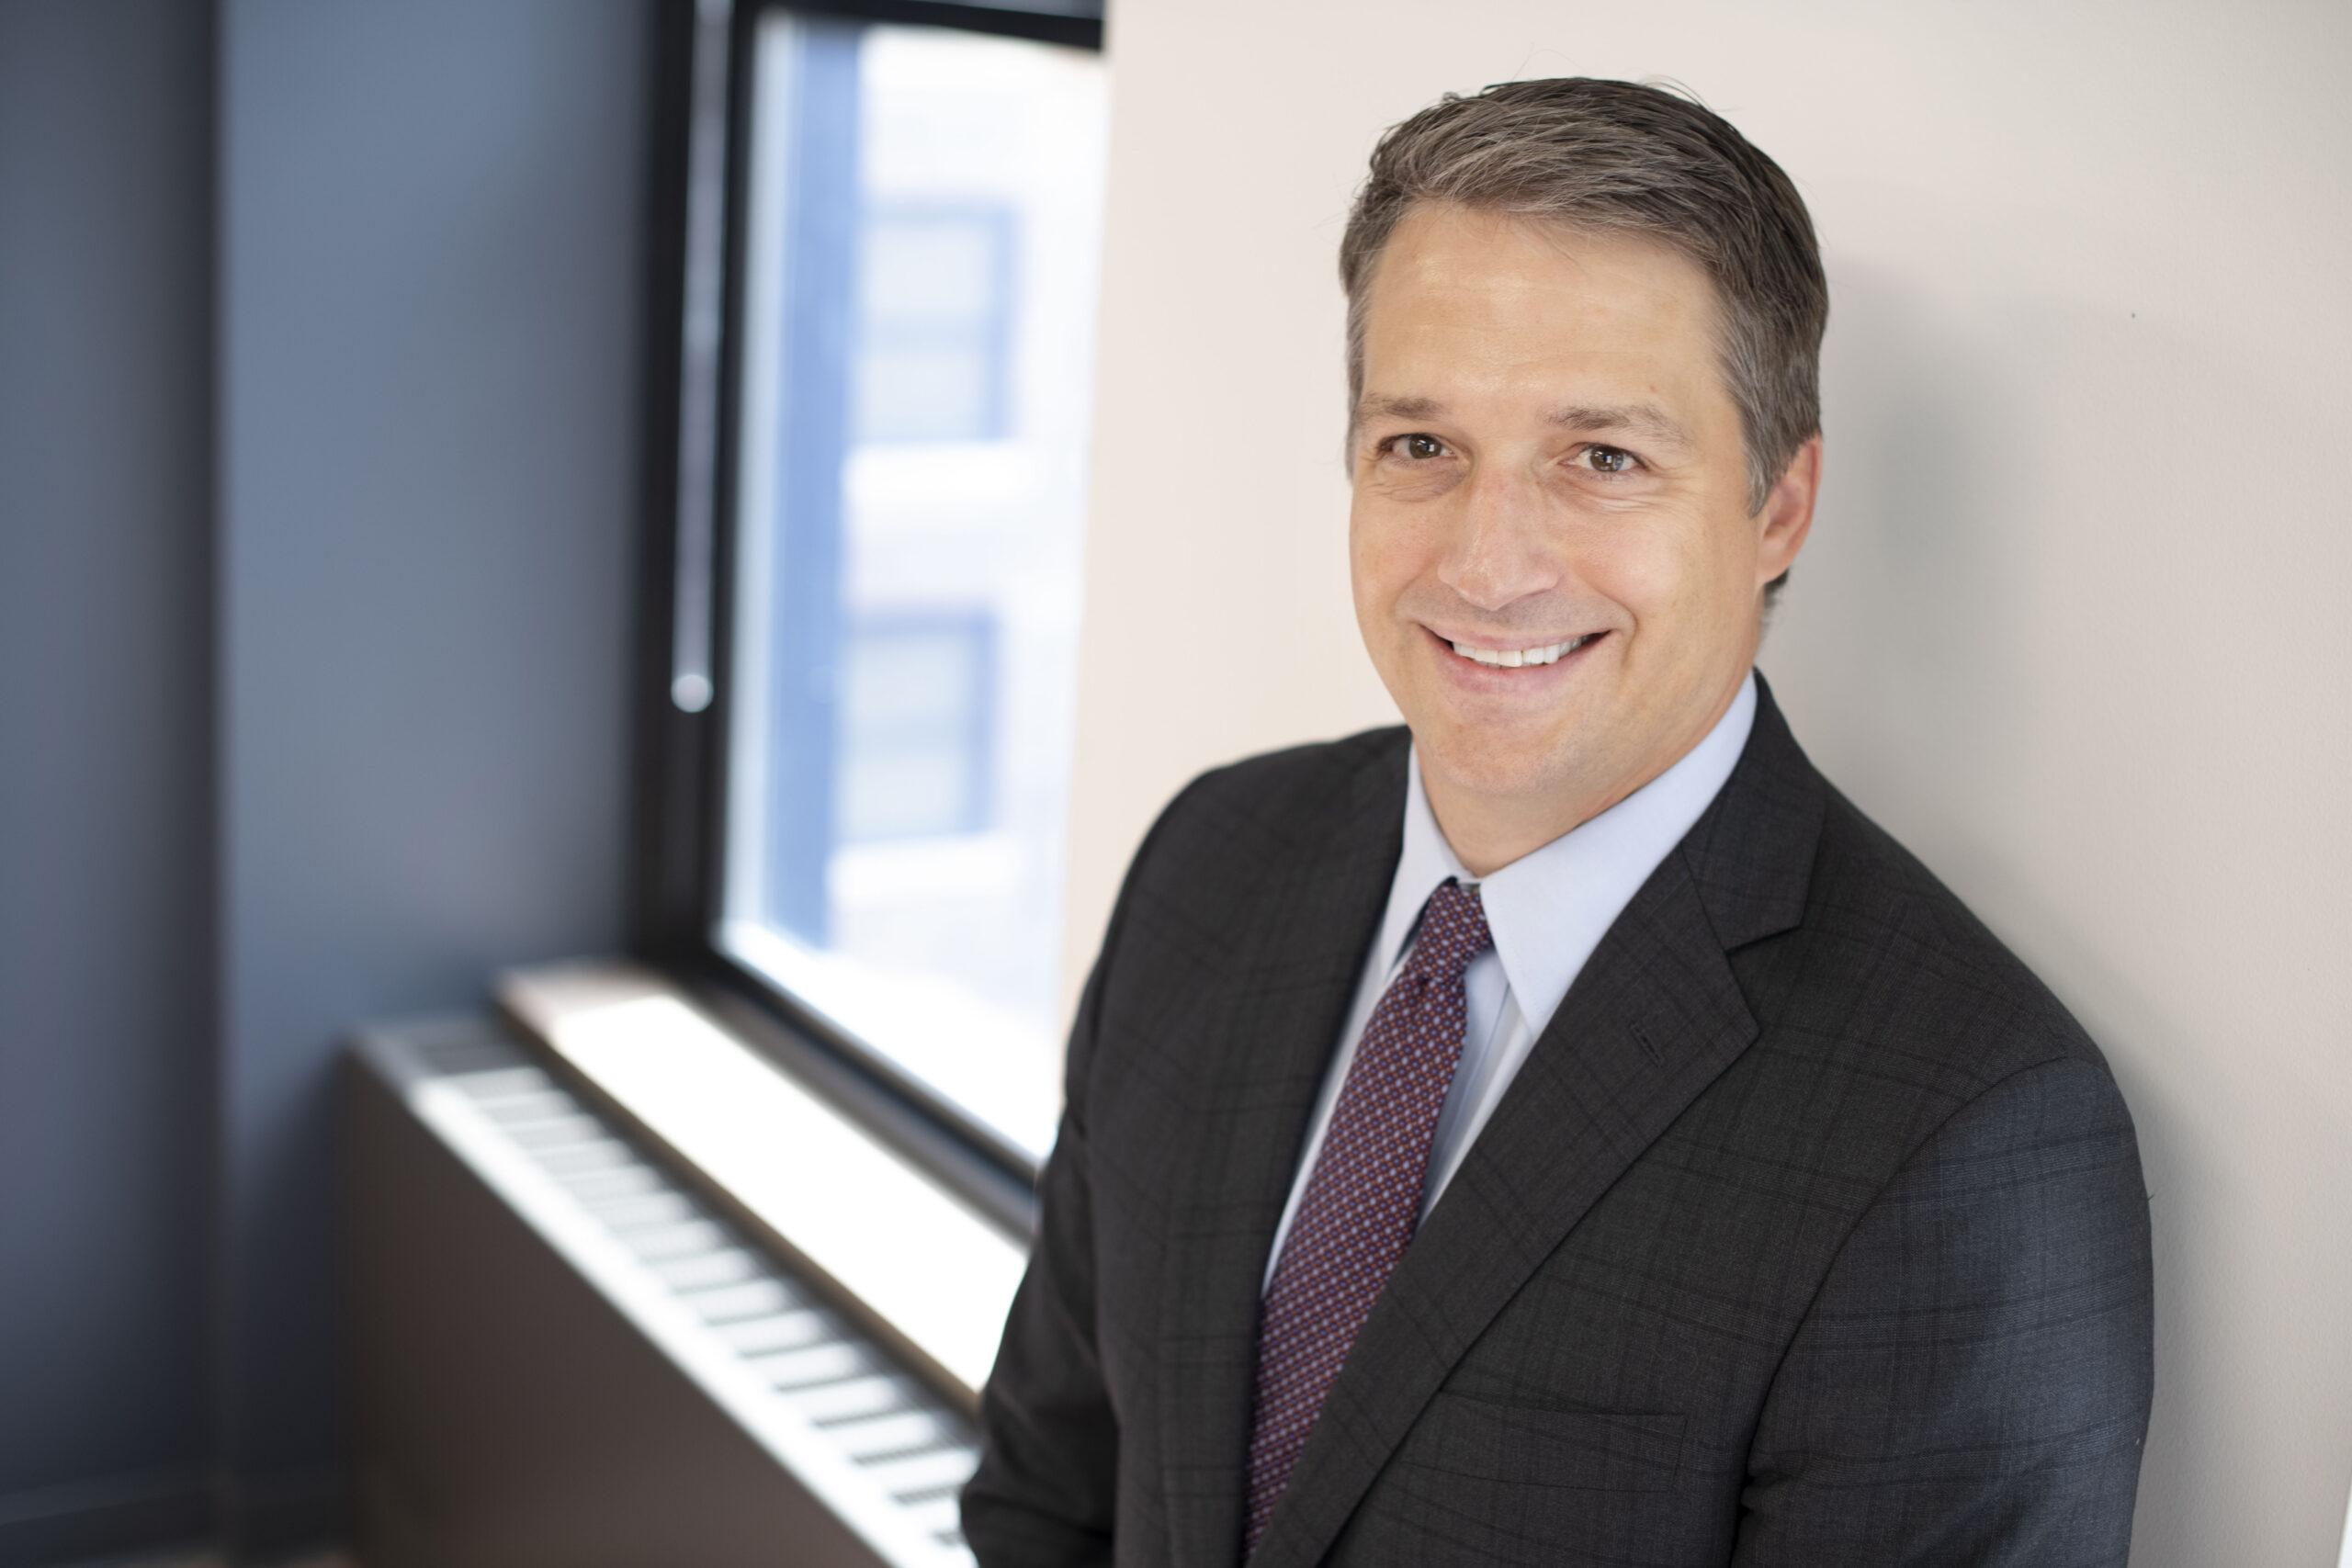 Steven R. Kluz